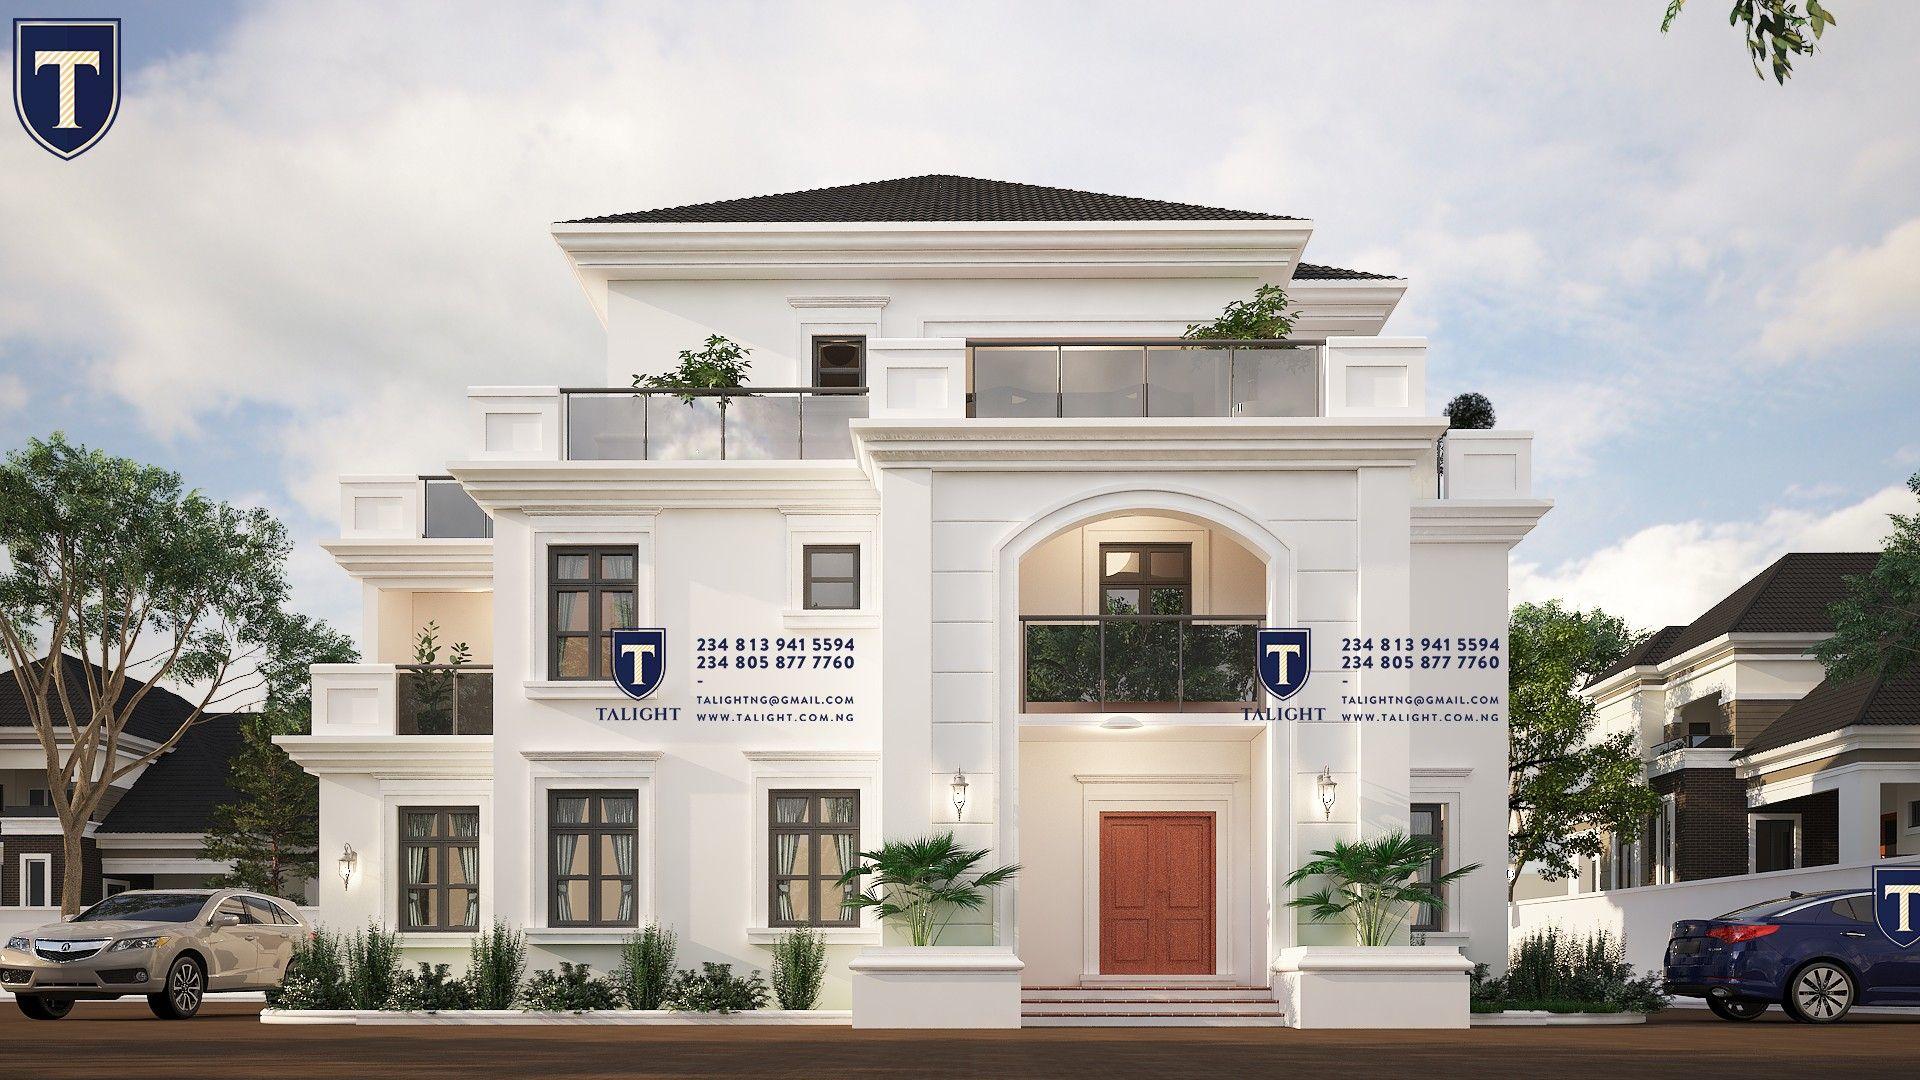 20e8006b1280b443d1faf21775307bd0 - Download Dream House Modern Duplex House Designs In Nigeria Background